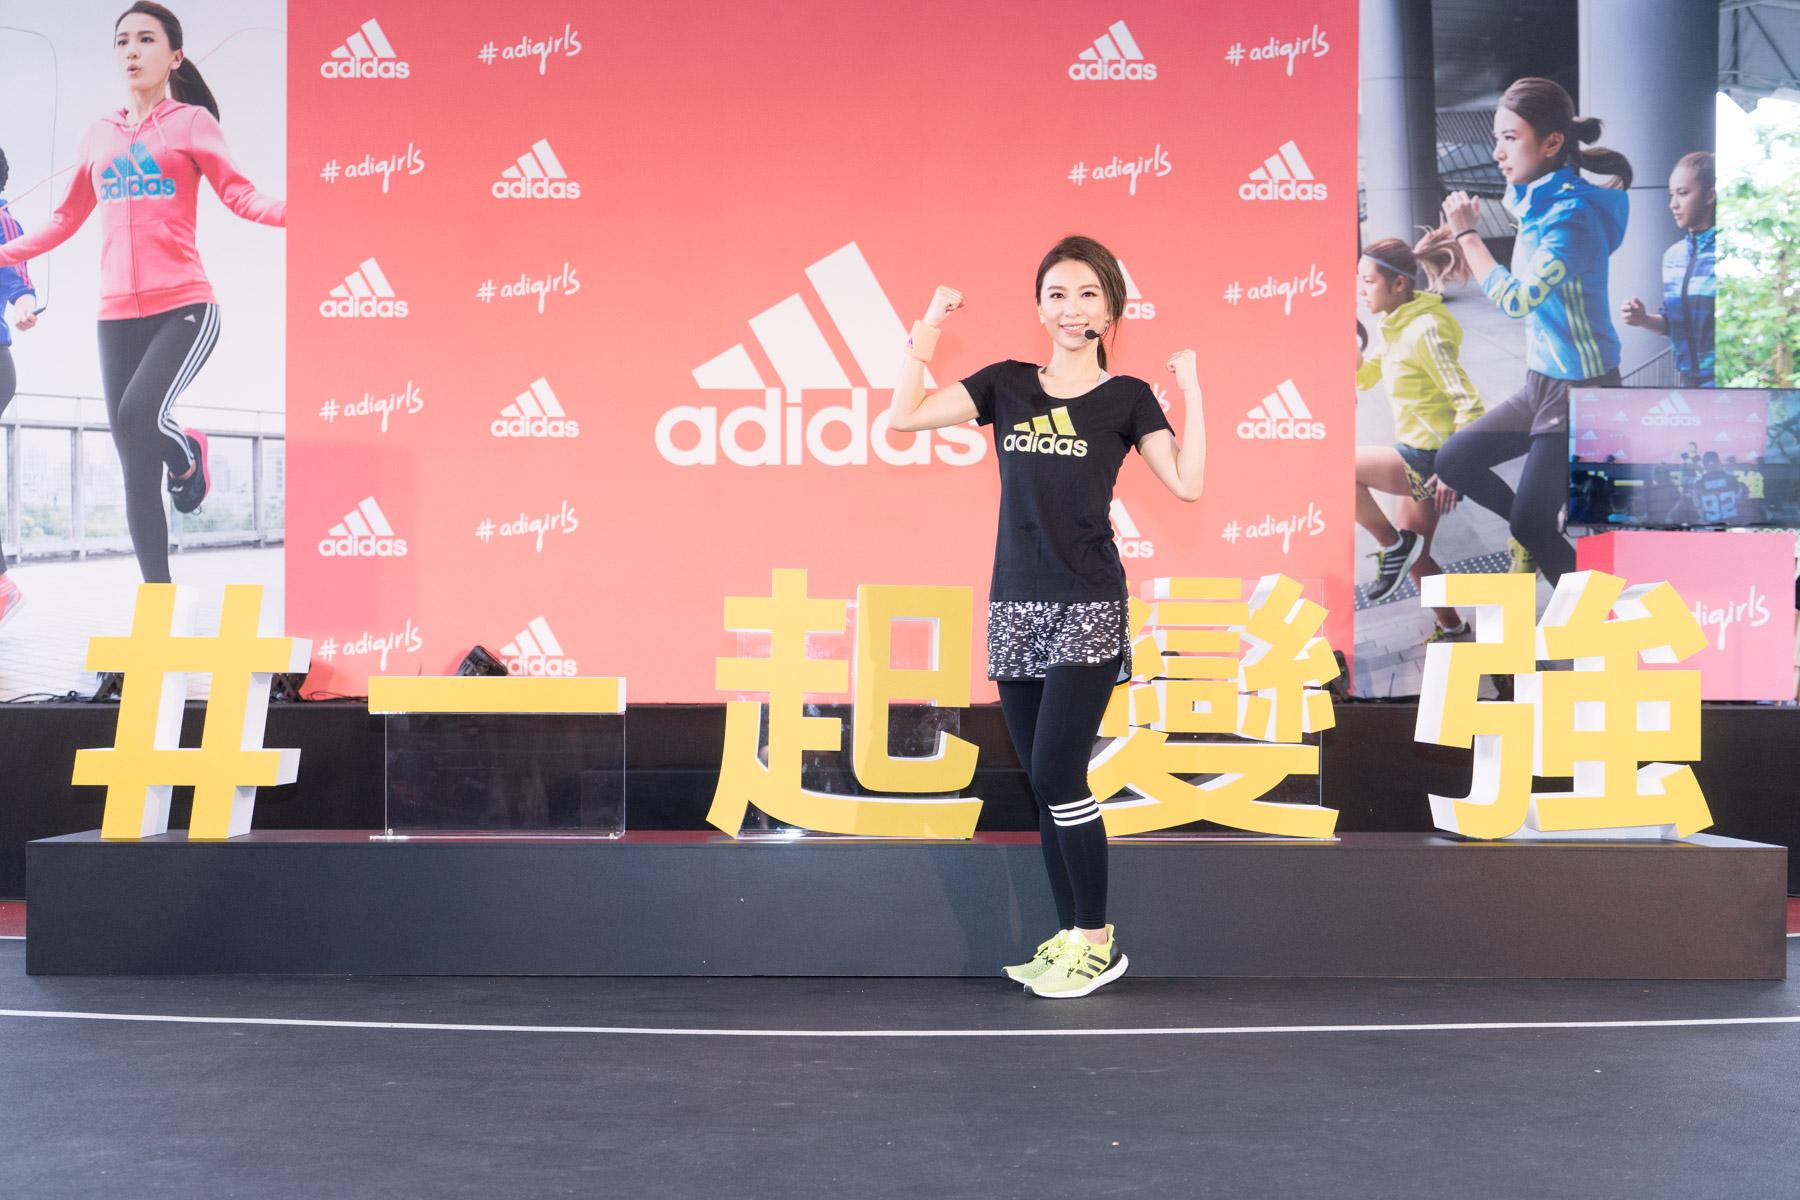 adidas-adigirls press conference 20150924-18